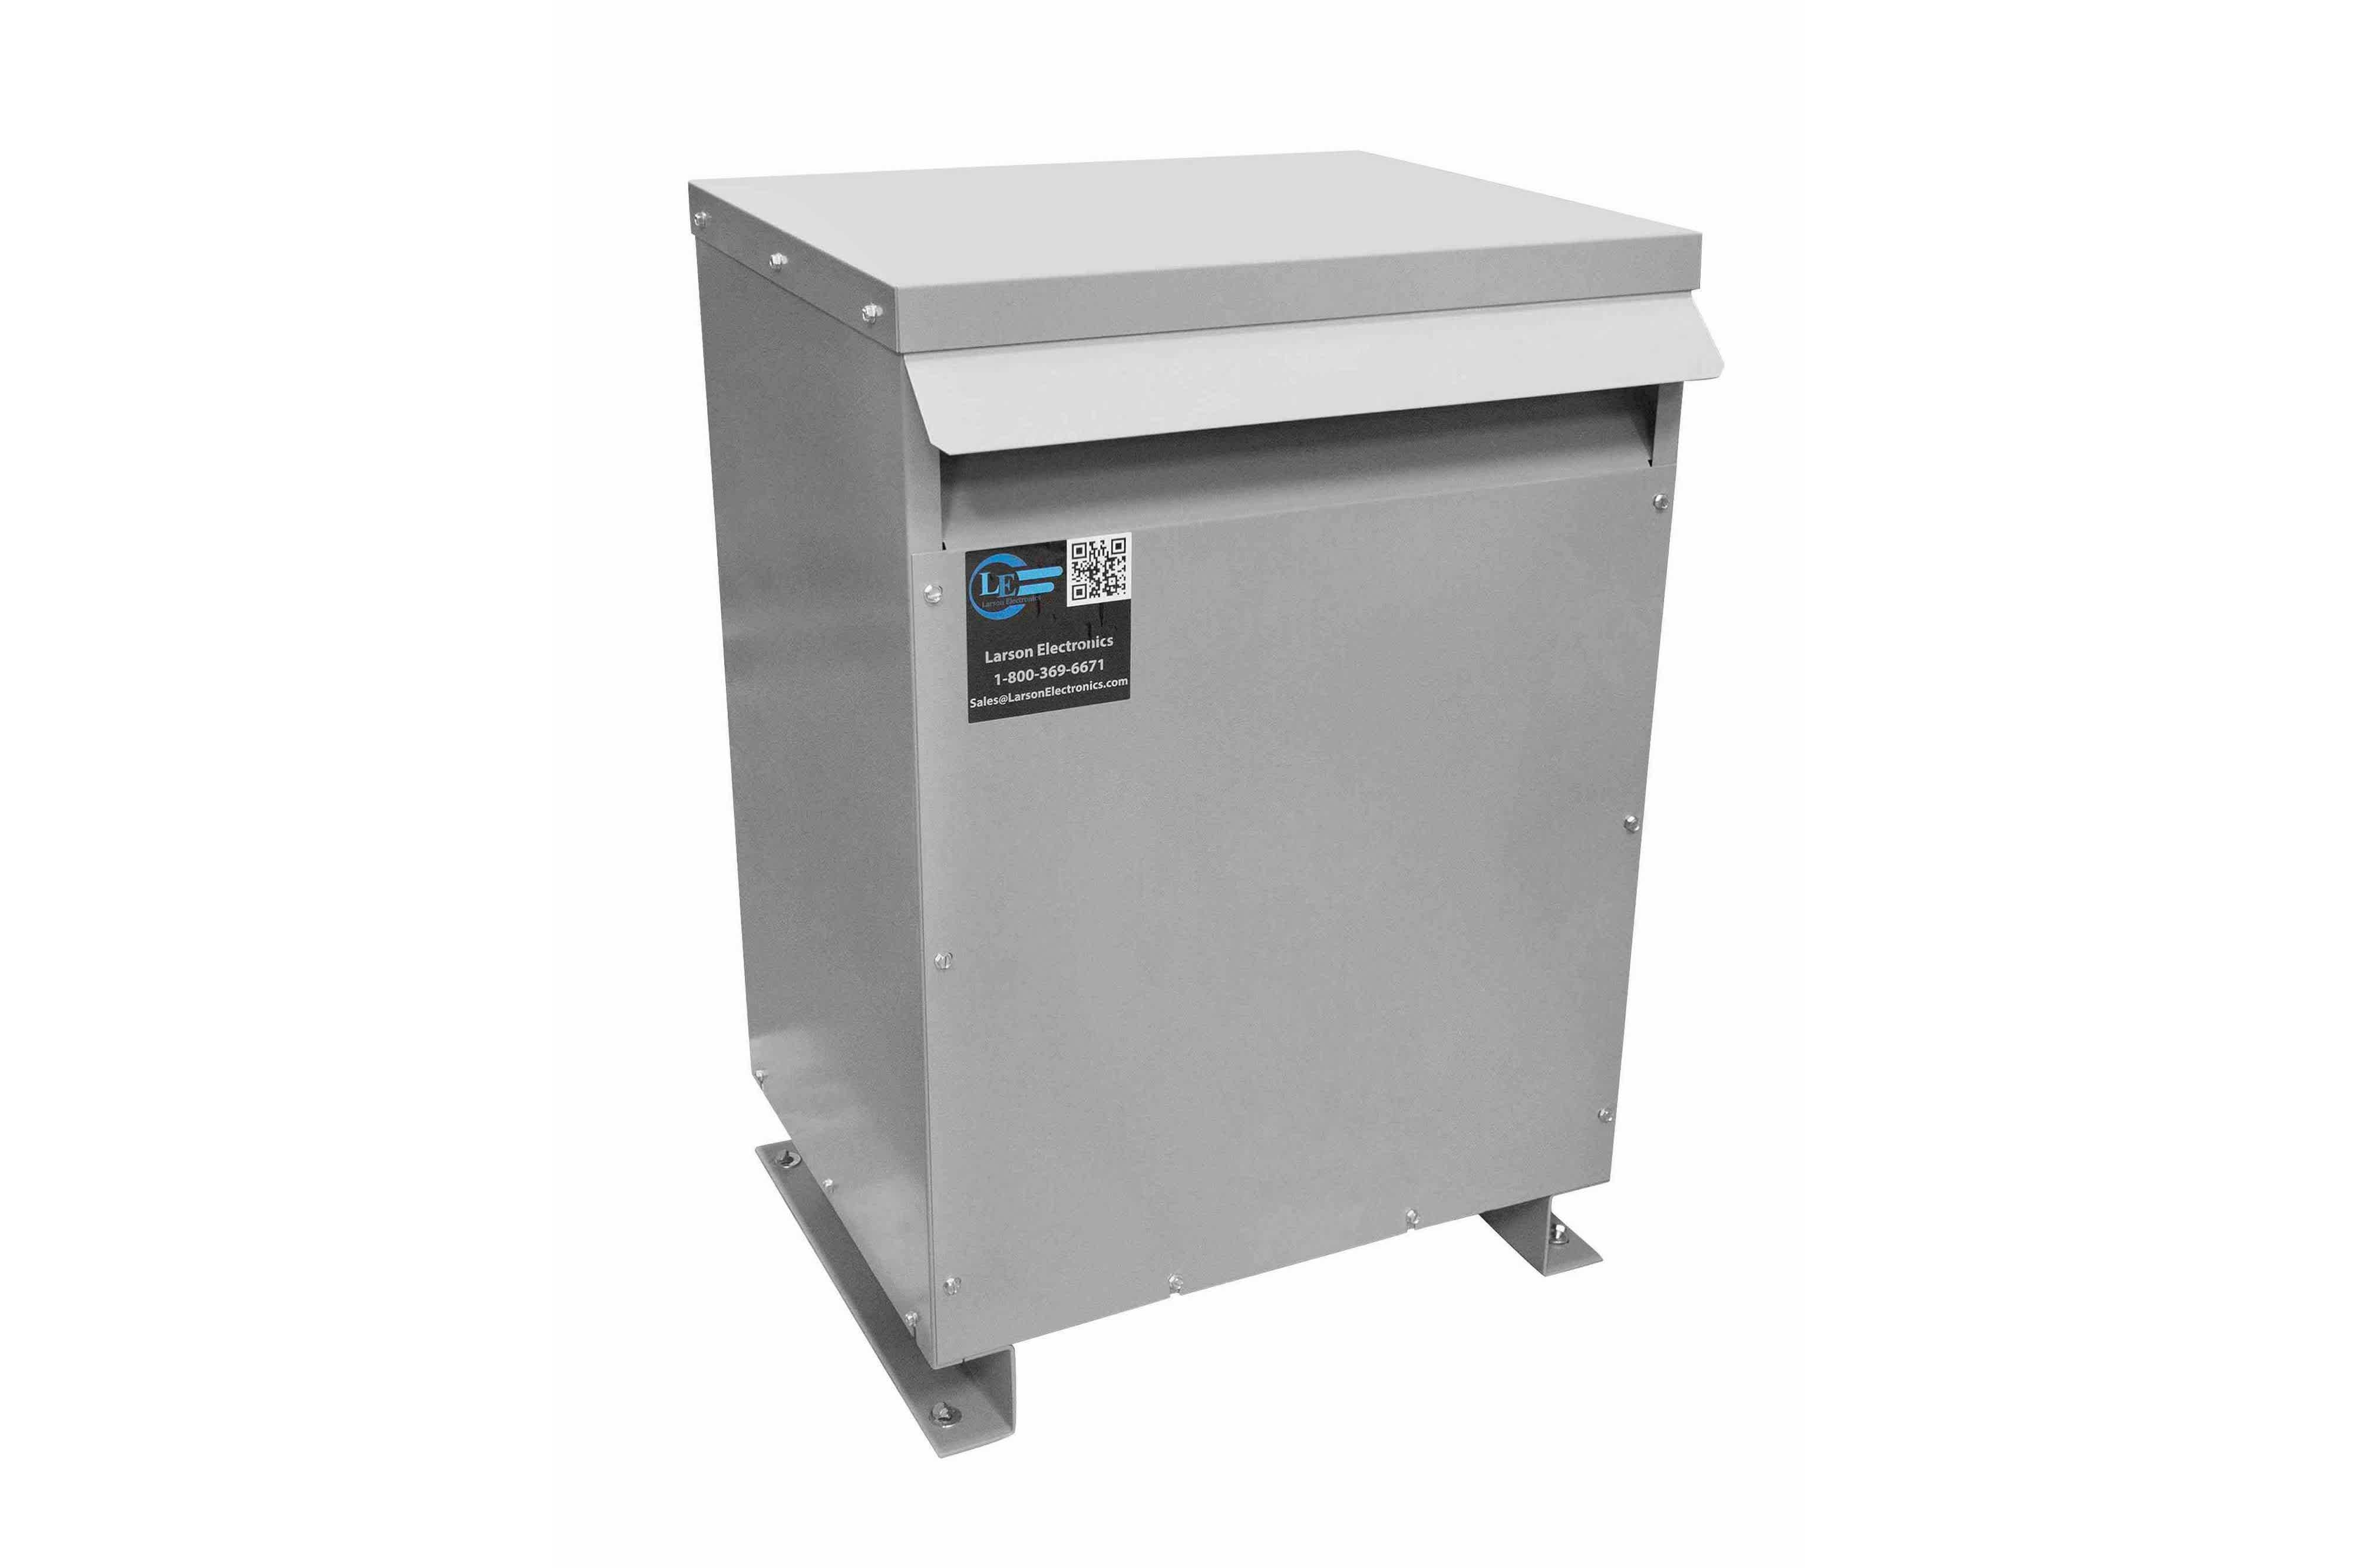 275 kVA 3PH Isolation Transformer, 208V Wye Primary, 415V Delta Secondary, N3R, Ventilated, 60 Hz